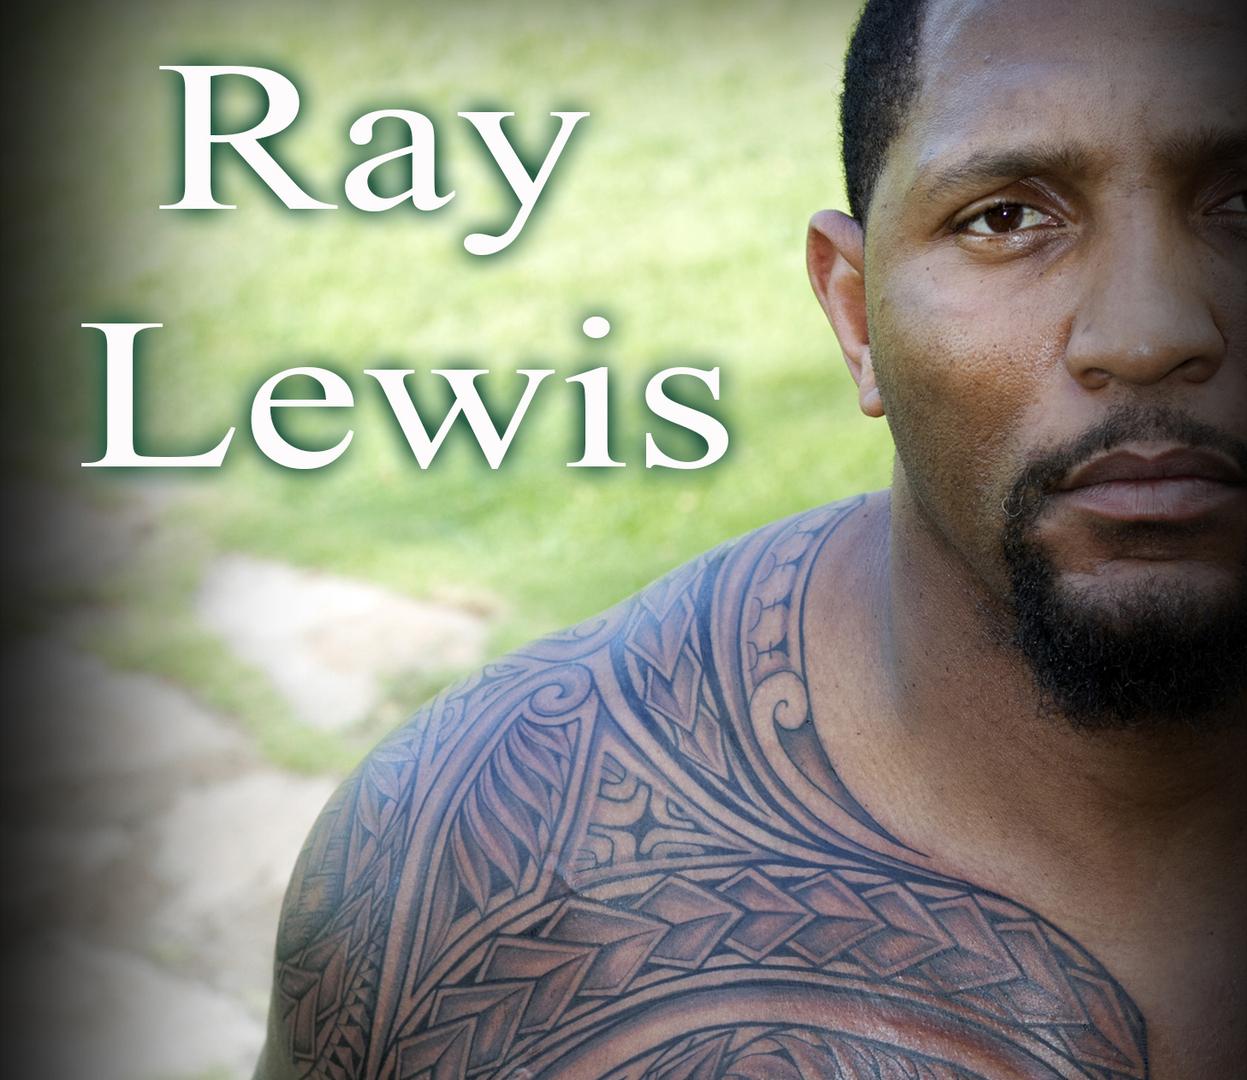 Polynesian Tribal Tattoos - Island Tat Evolve